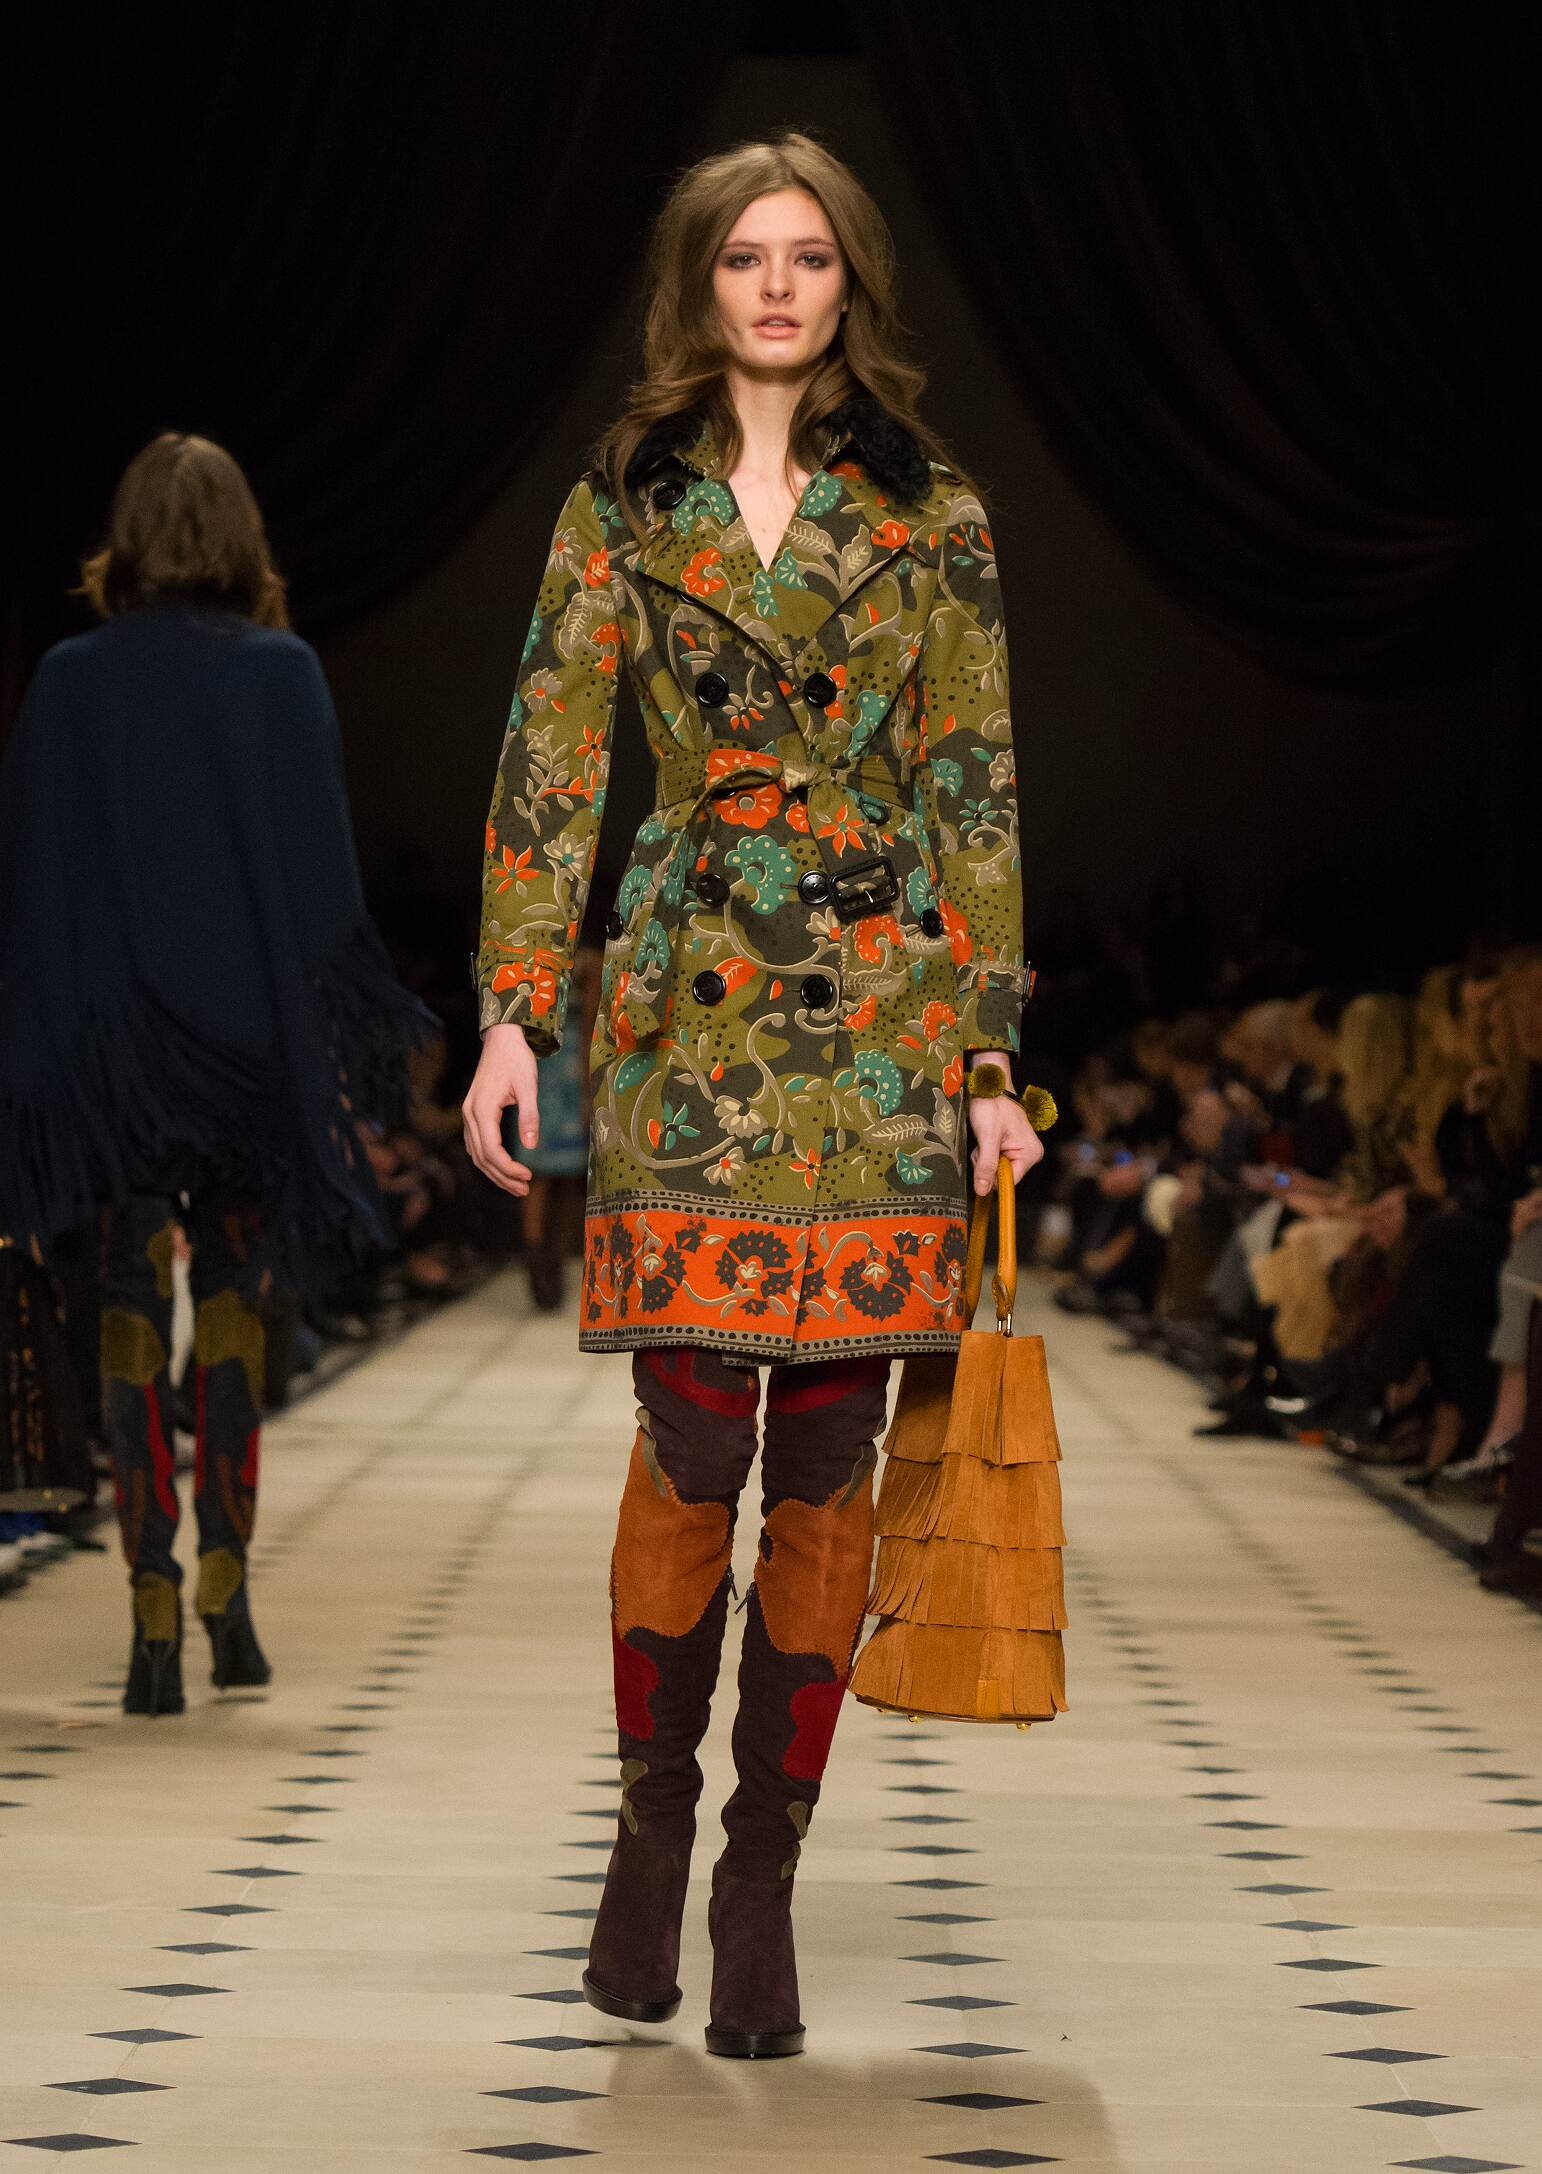 dress - Prorsum burberry fall winter collection video